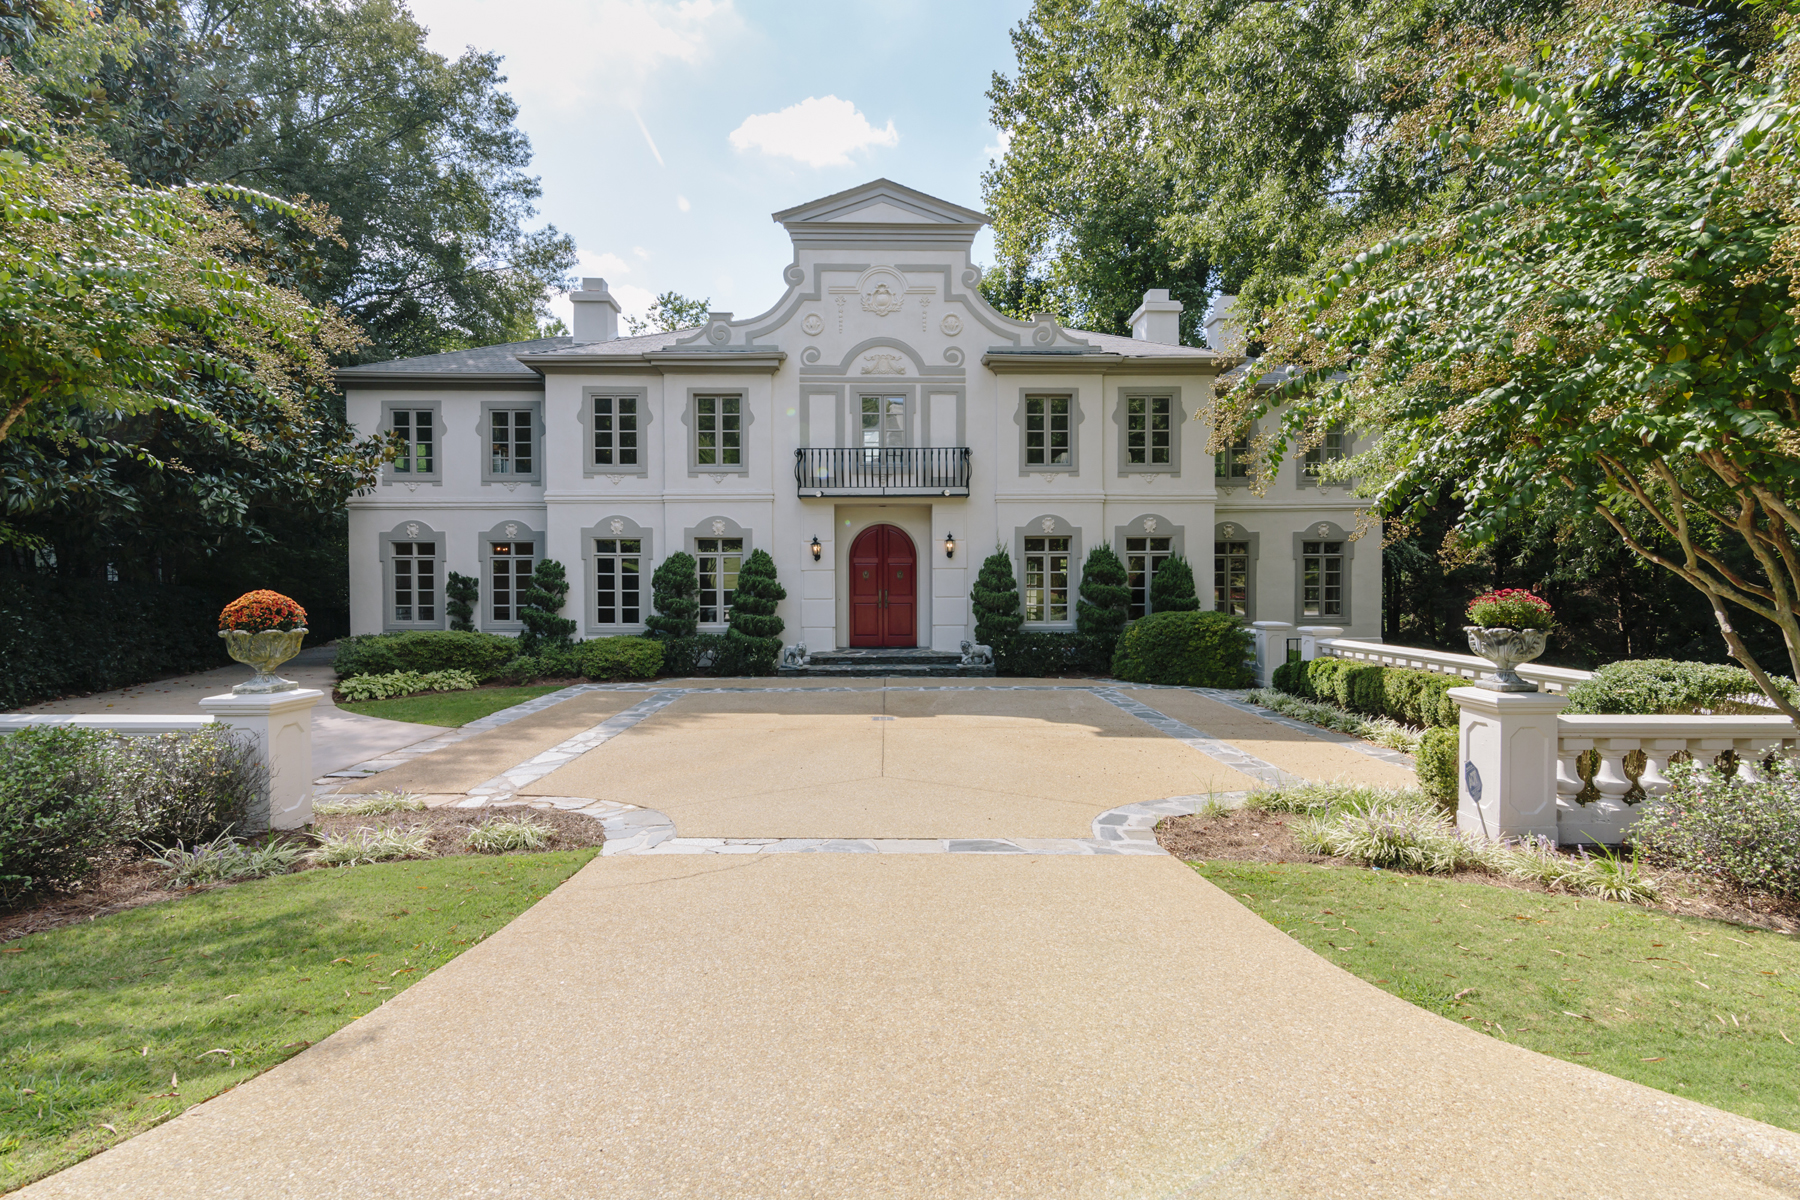 Single Family Home for Sale at Elegant Buckhead Home 2760 Carmon On Wesley NW Buckhead, Atlanta, Georgia 30327 United States